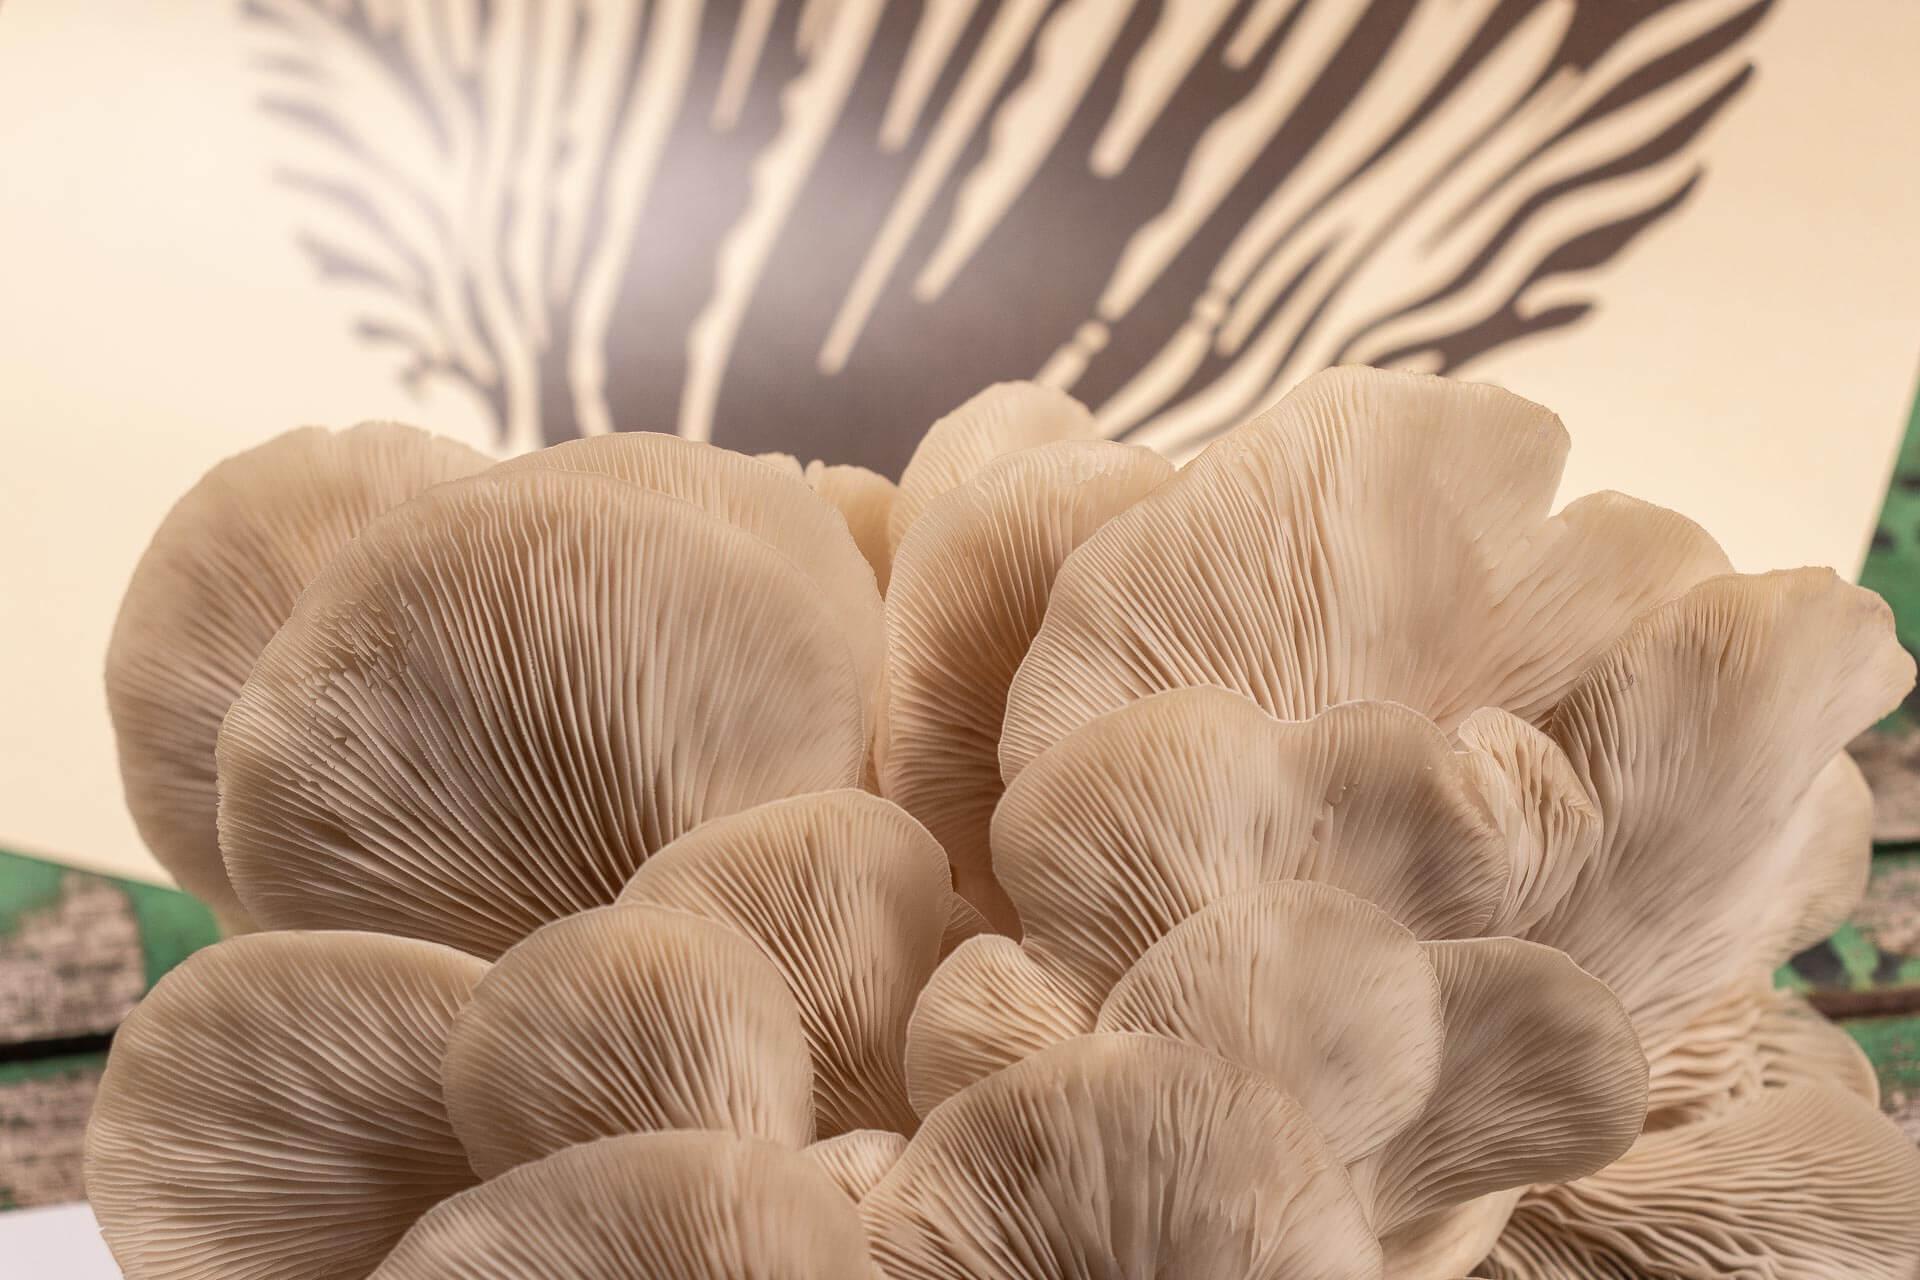 Mushroom Forestry corporate identity logo design branding mushroom eco fast moving consumer goods FMCG foodie packaging Australia Vibranding